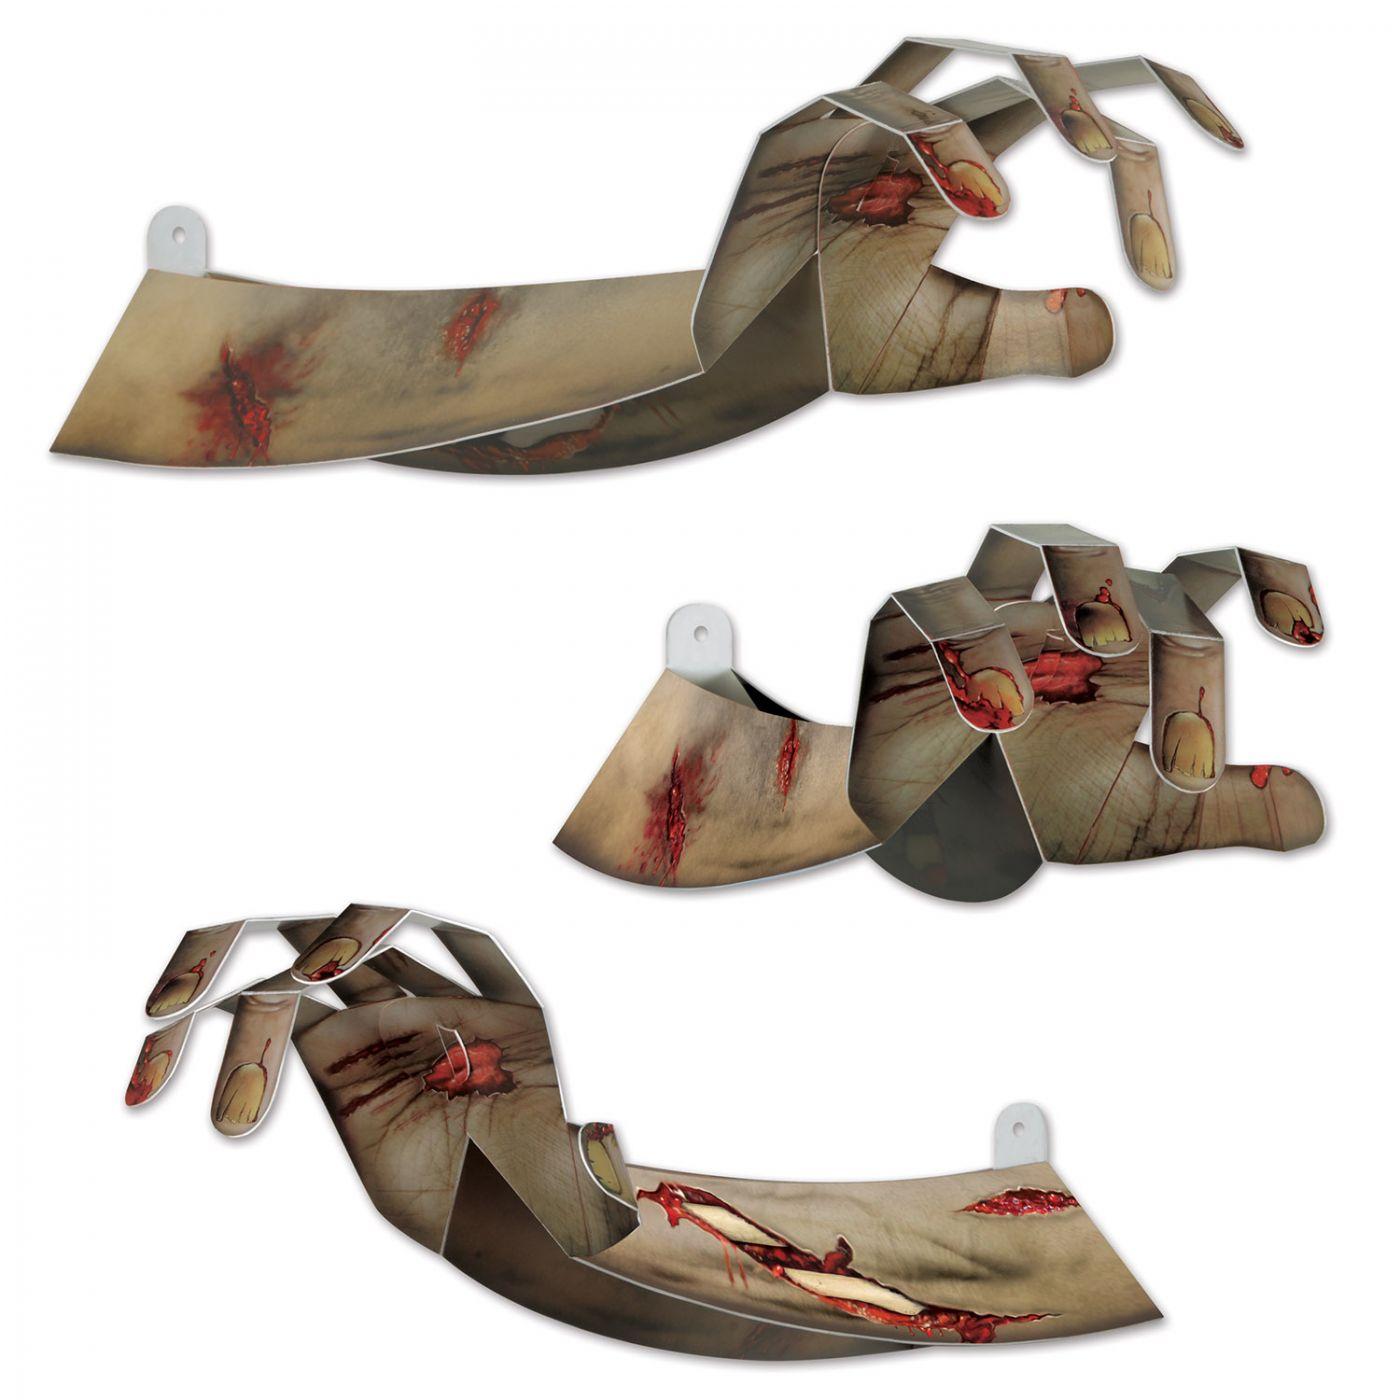 3-D Zombie Hands image